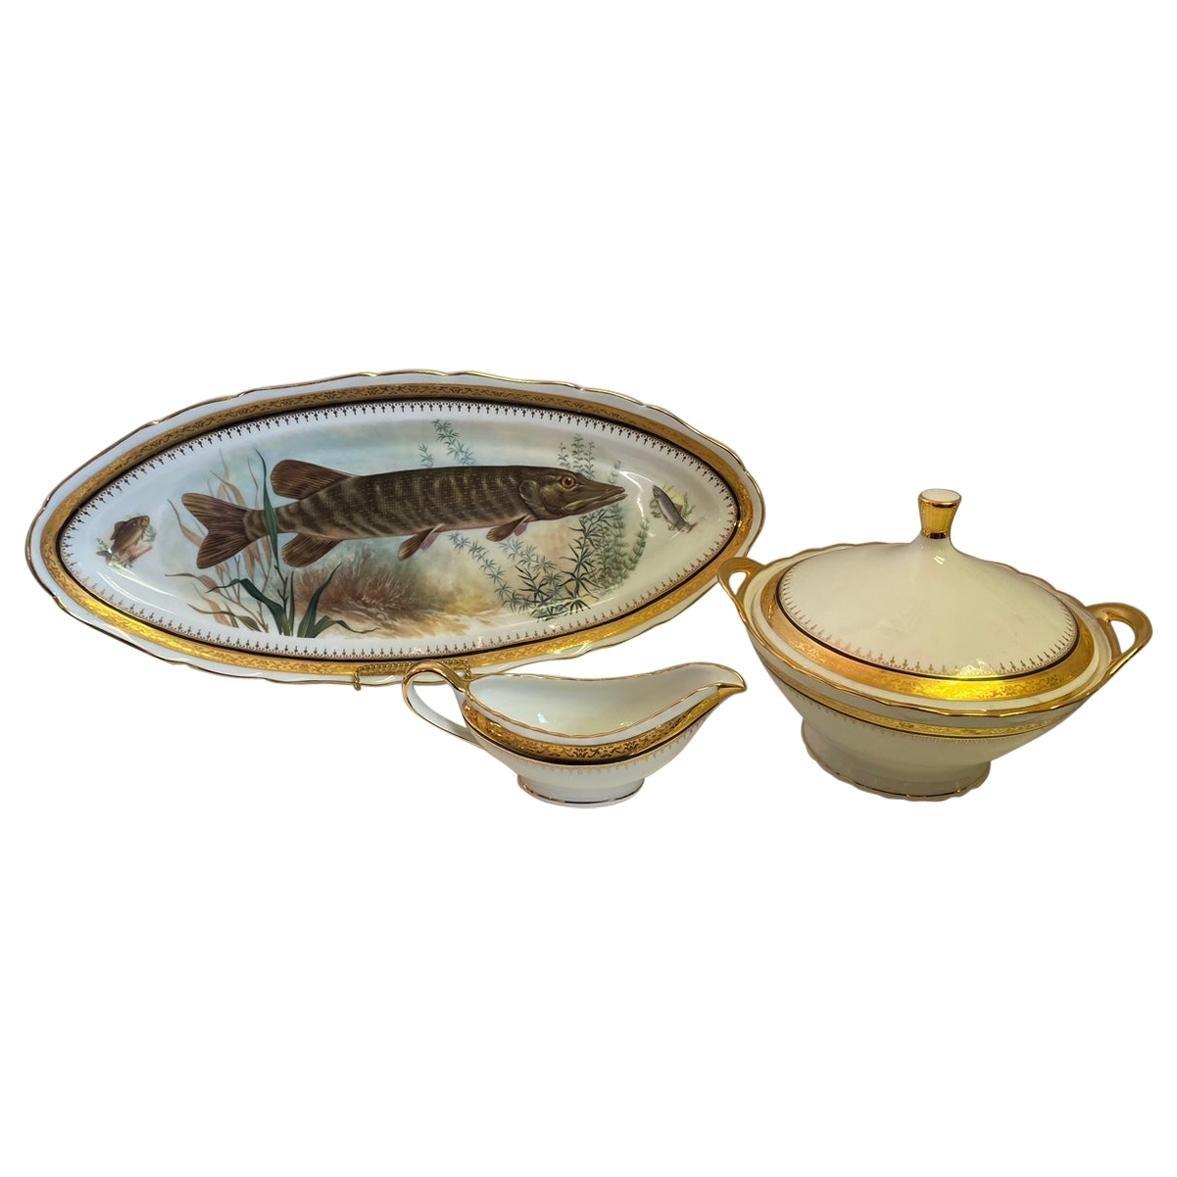 Vintage French Porcelain Serving Pieces, Set of 3